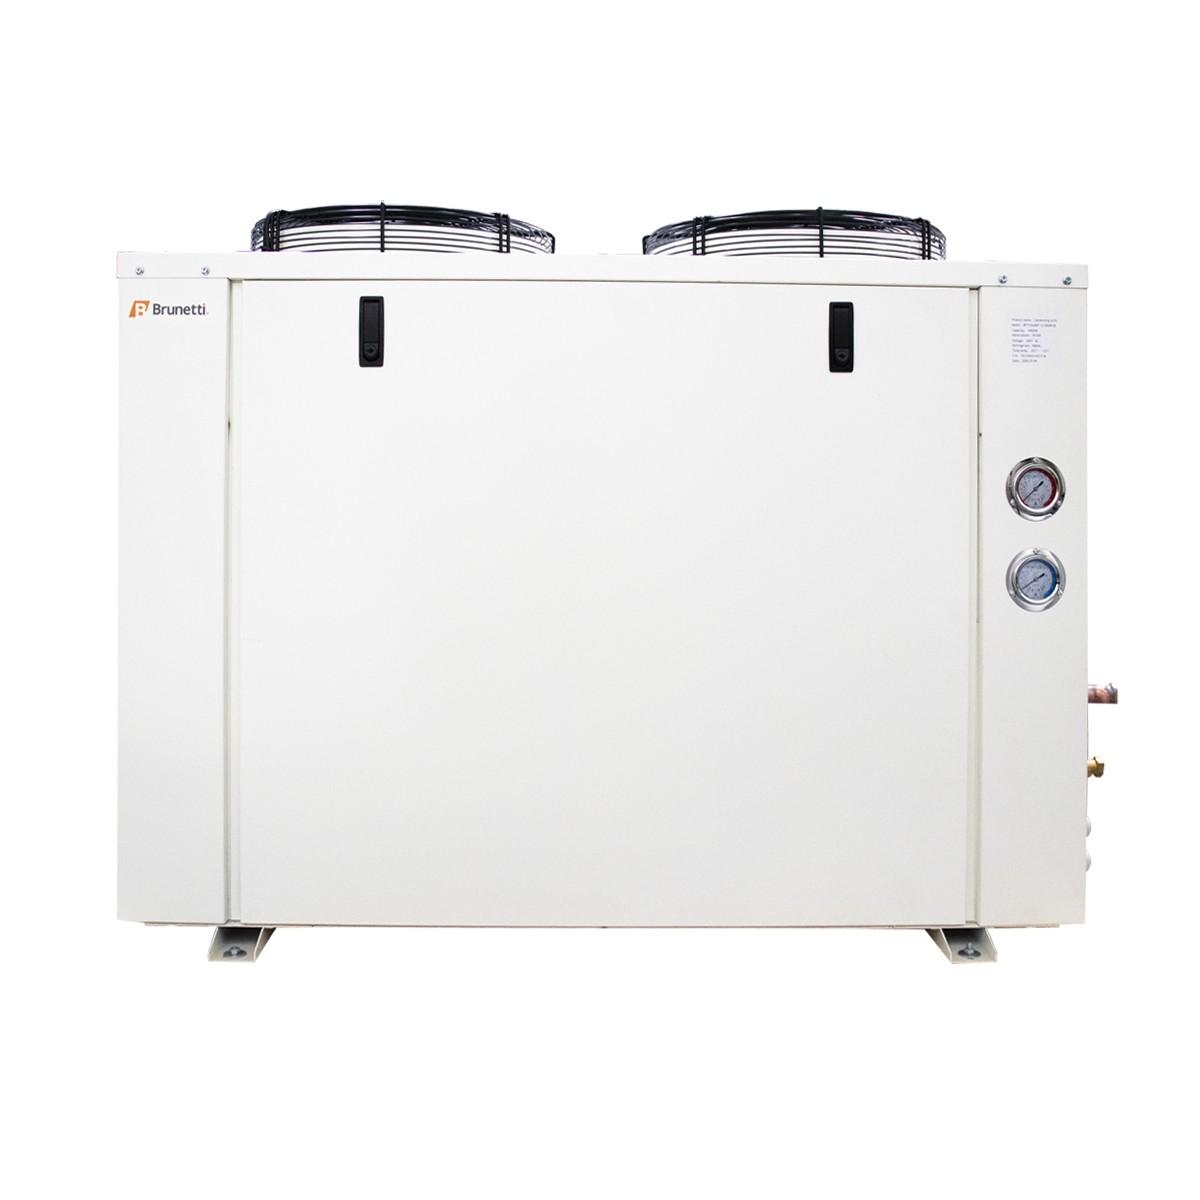 Unidad Condensadora MT Brunetti UCMT-C-80B 8HP